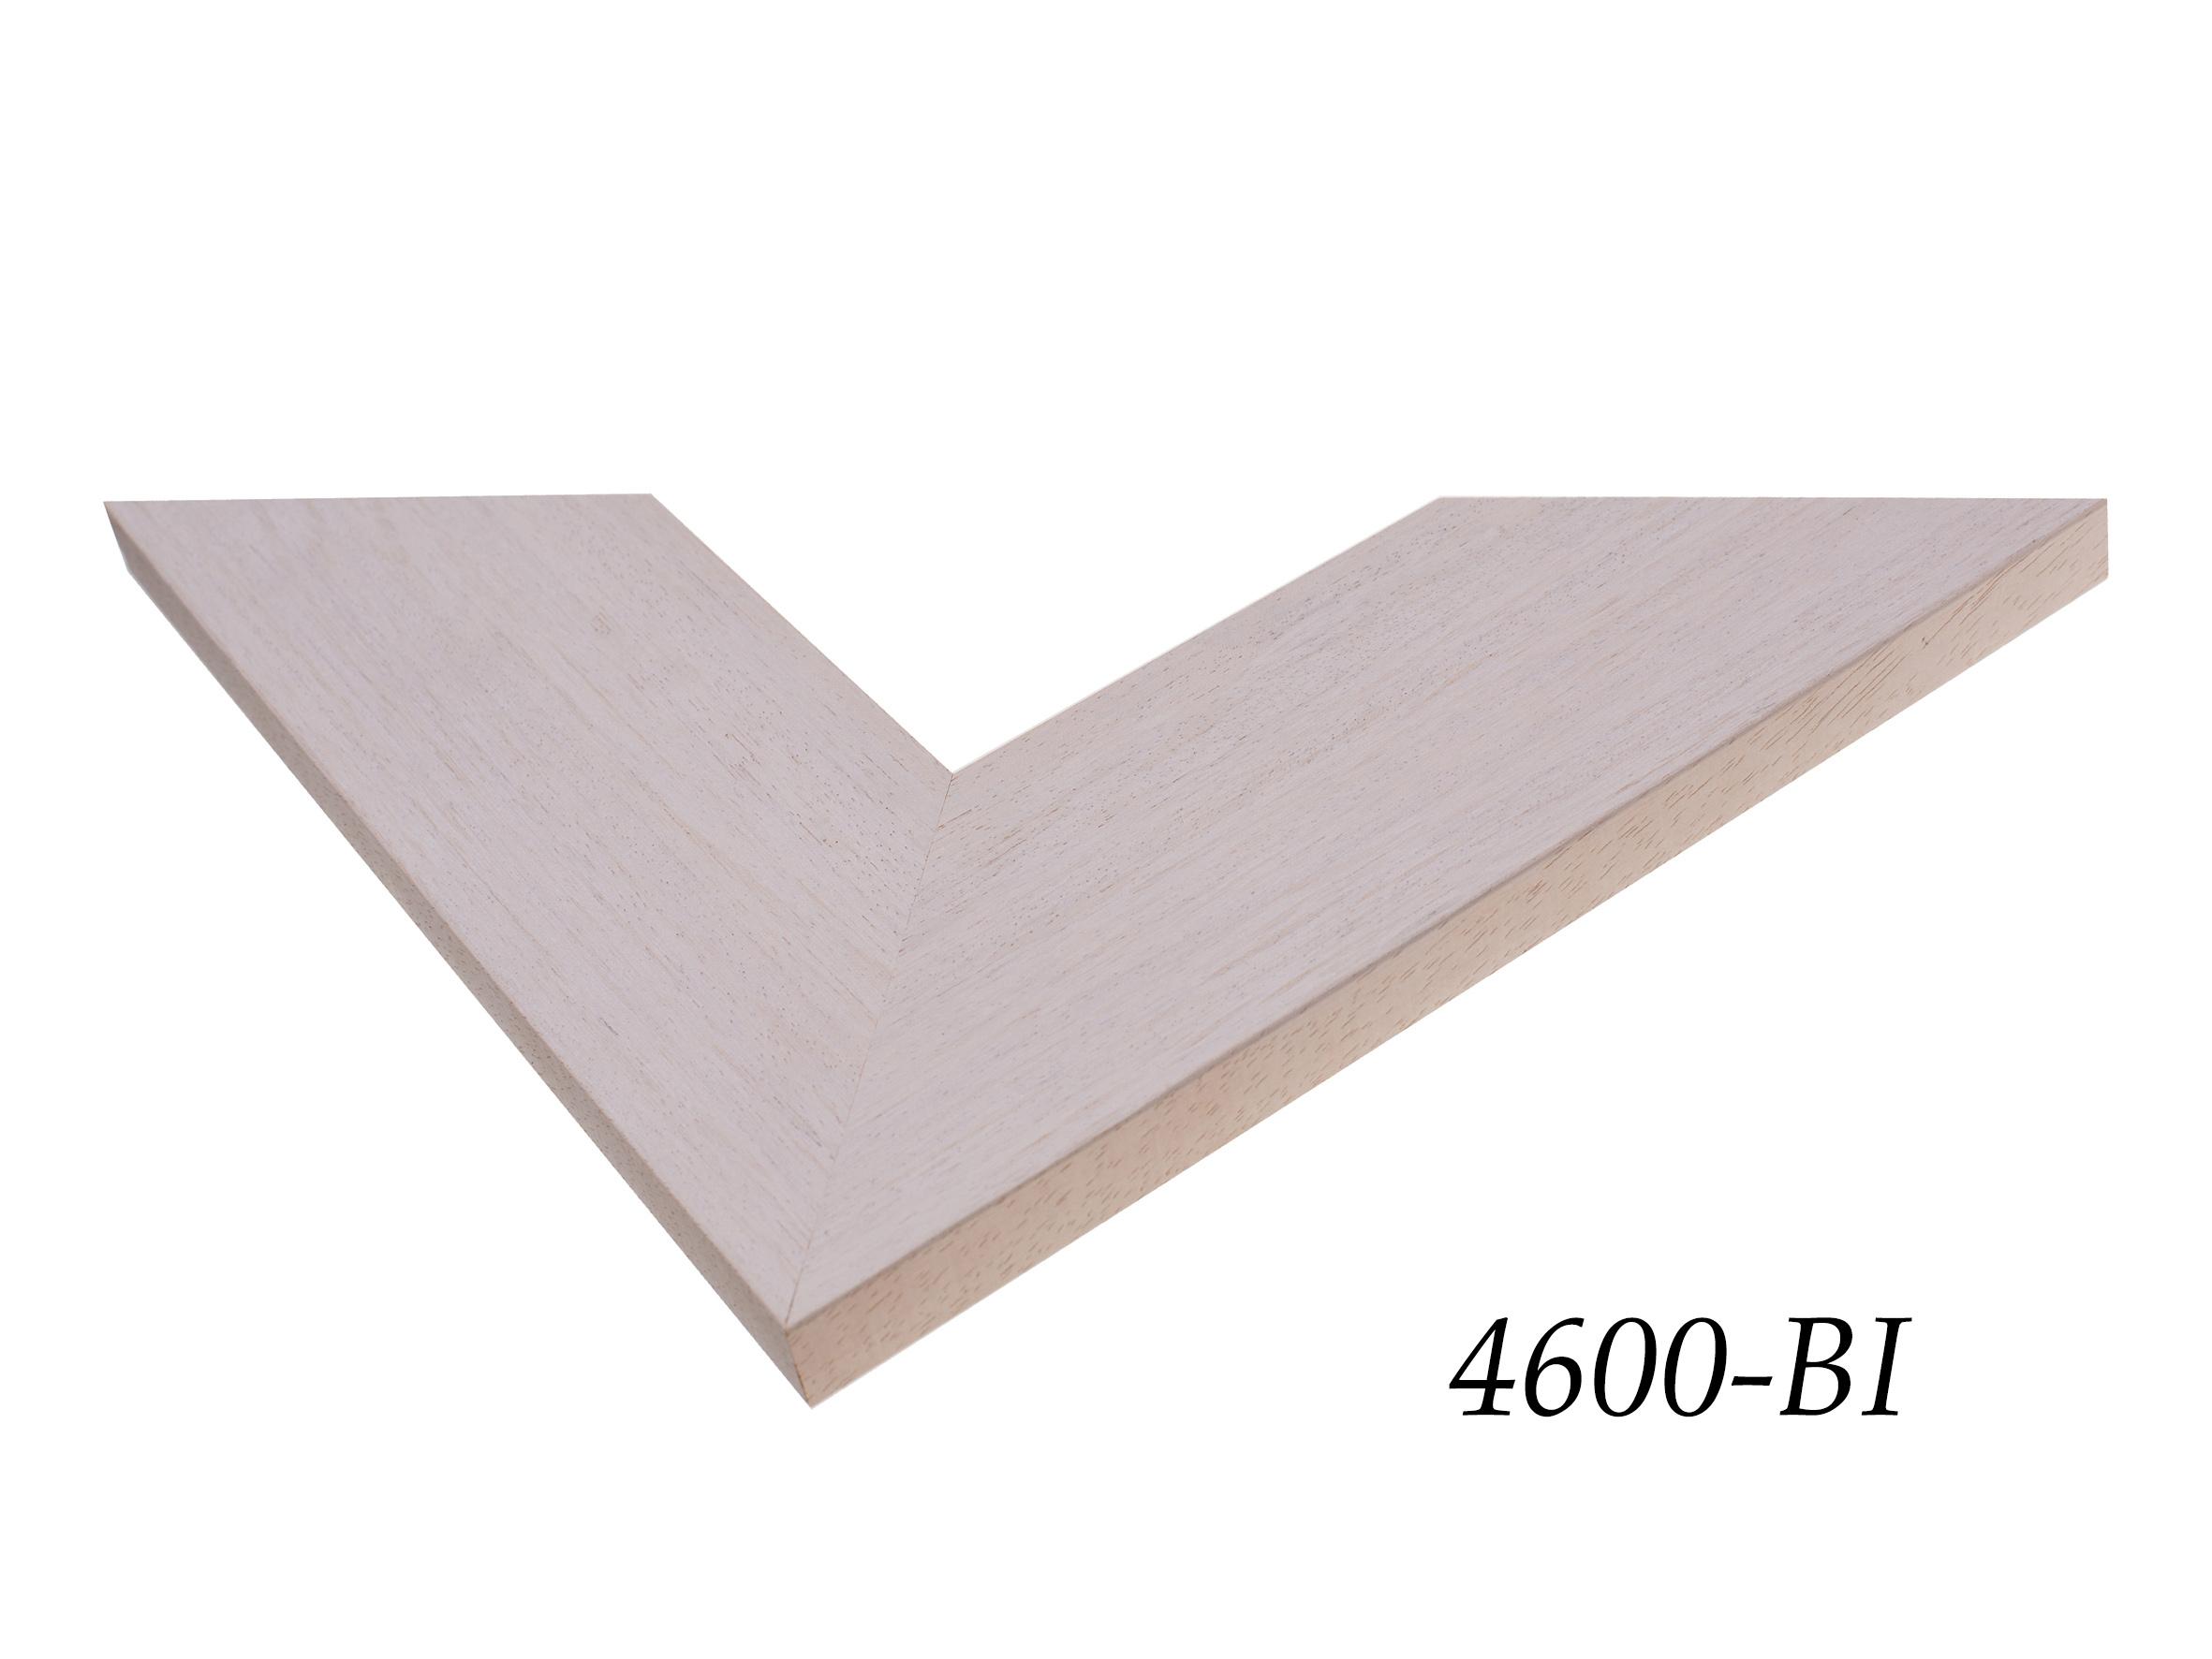 4600-BI